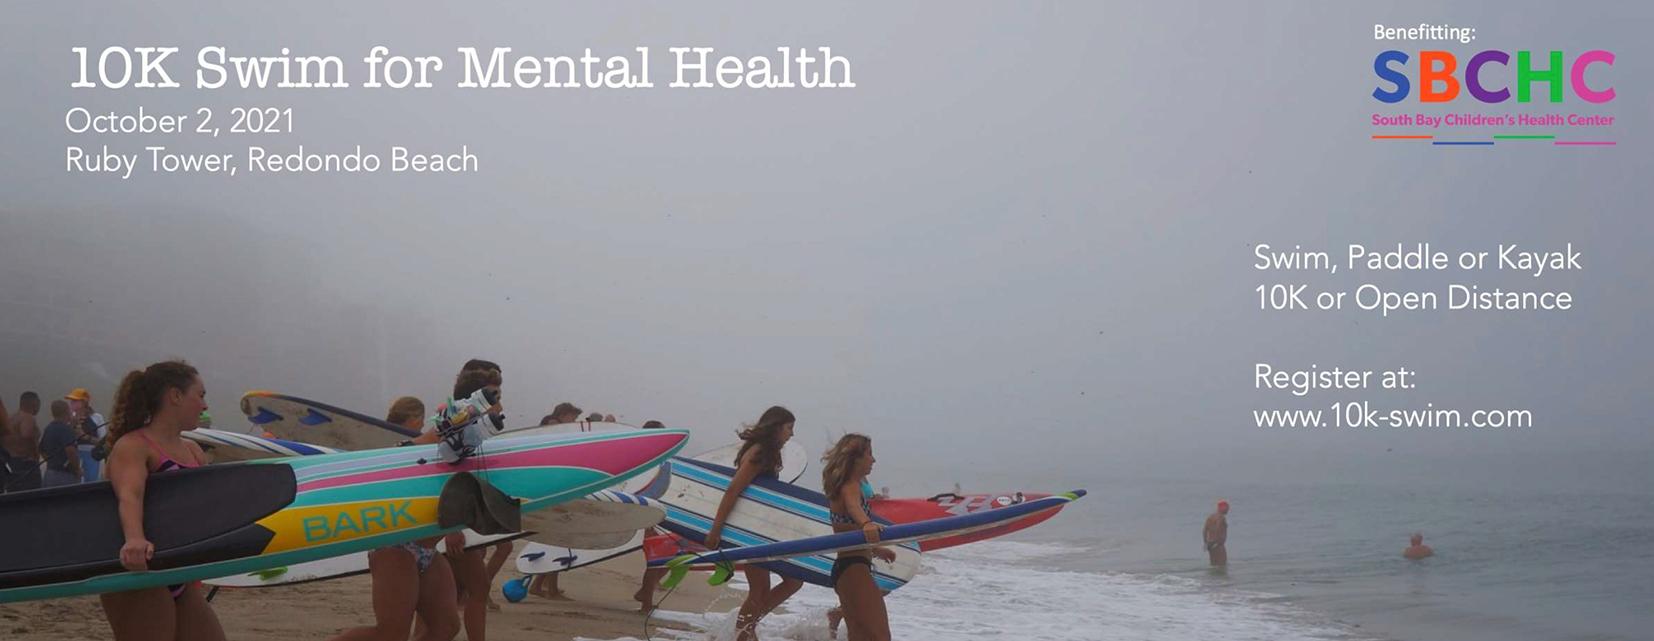 10K Swim for Mental Health